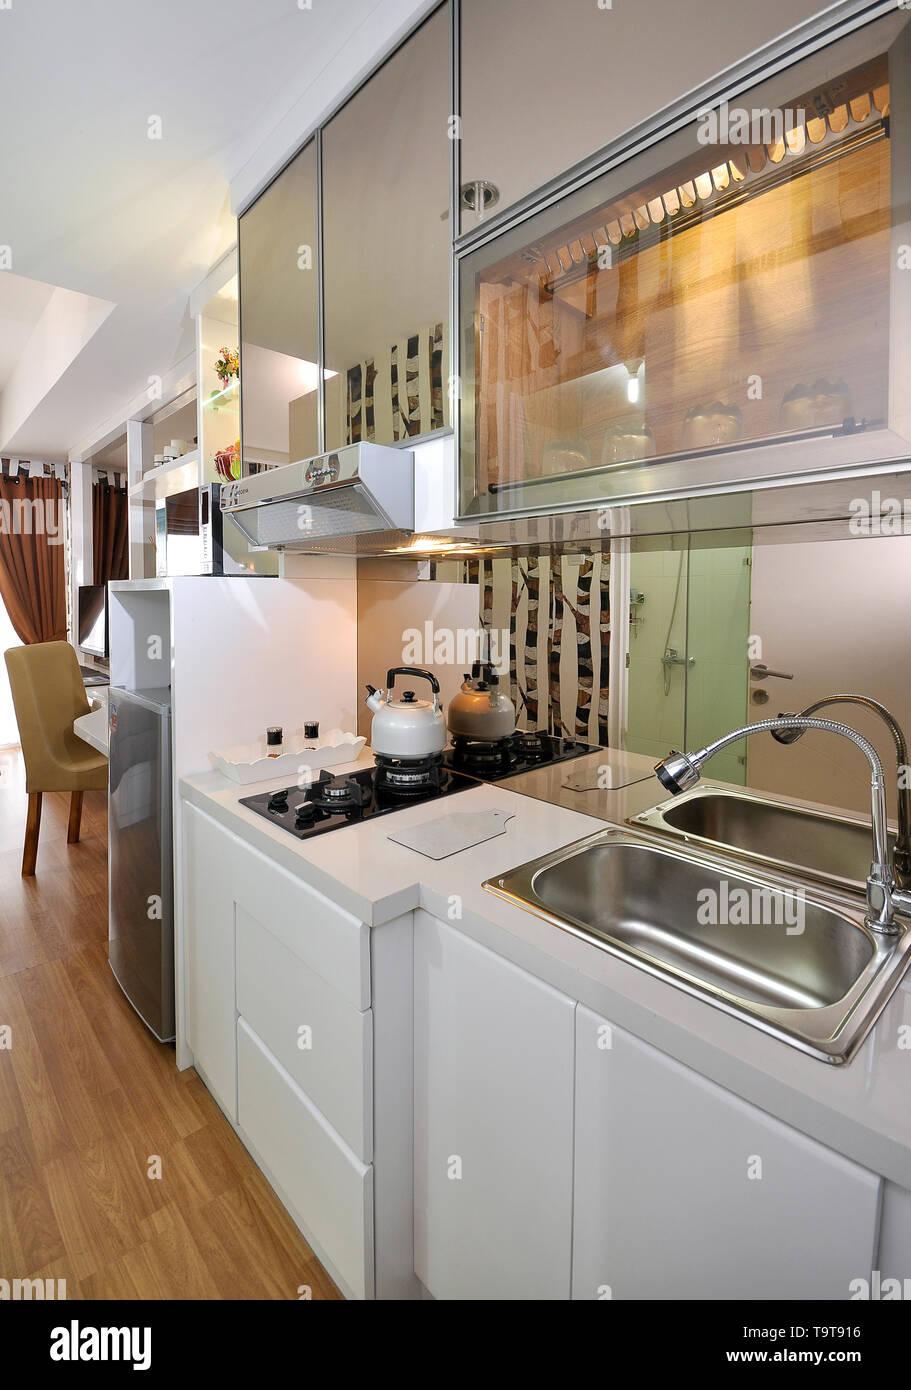 Kitchen Set At Small Apartement Studio Type Stock Photo Alamy